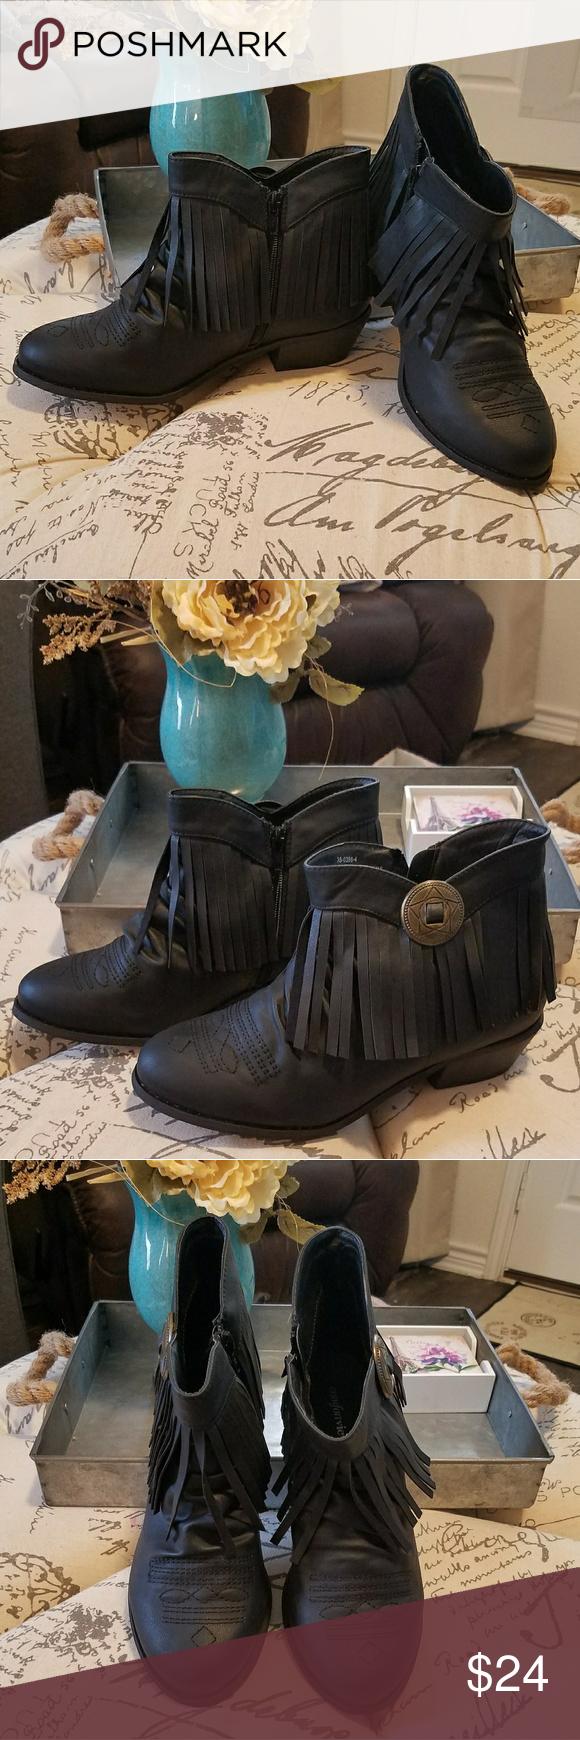 d8c4faf22df Comfortview Women Ankle Boots Black size 9 1 2 W Comfortview Ankle Boots  Black size